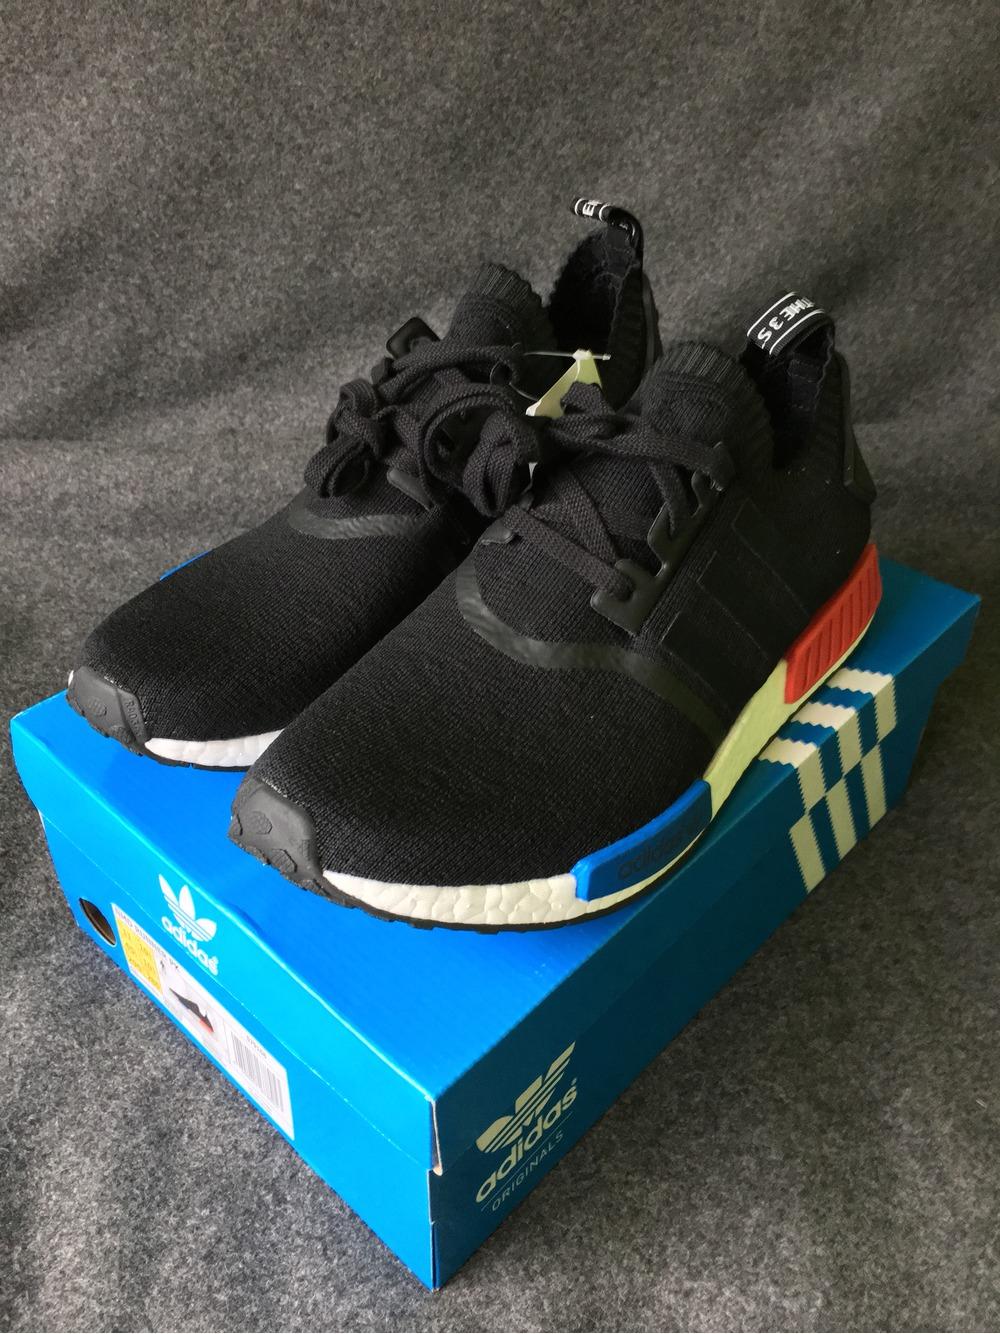 ugqtvf Adidas NMD Runner NMD RUNNER PK OG size 11 US DS (#302167) from